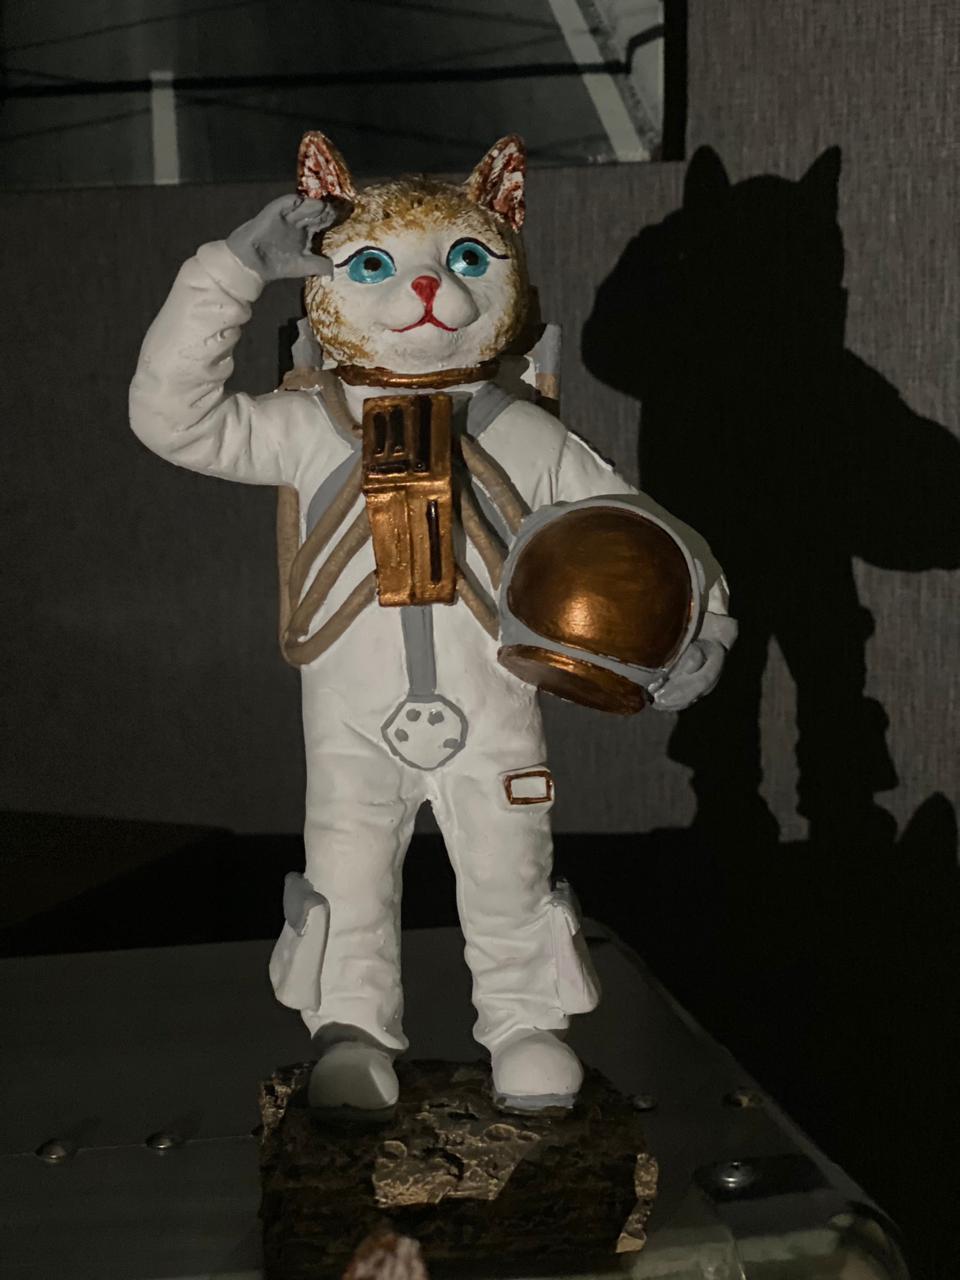 Estátua Cat Moon Gato Lua Nasa Astronauta Continência 25cm - EV